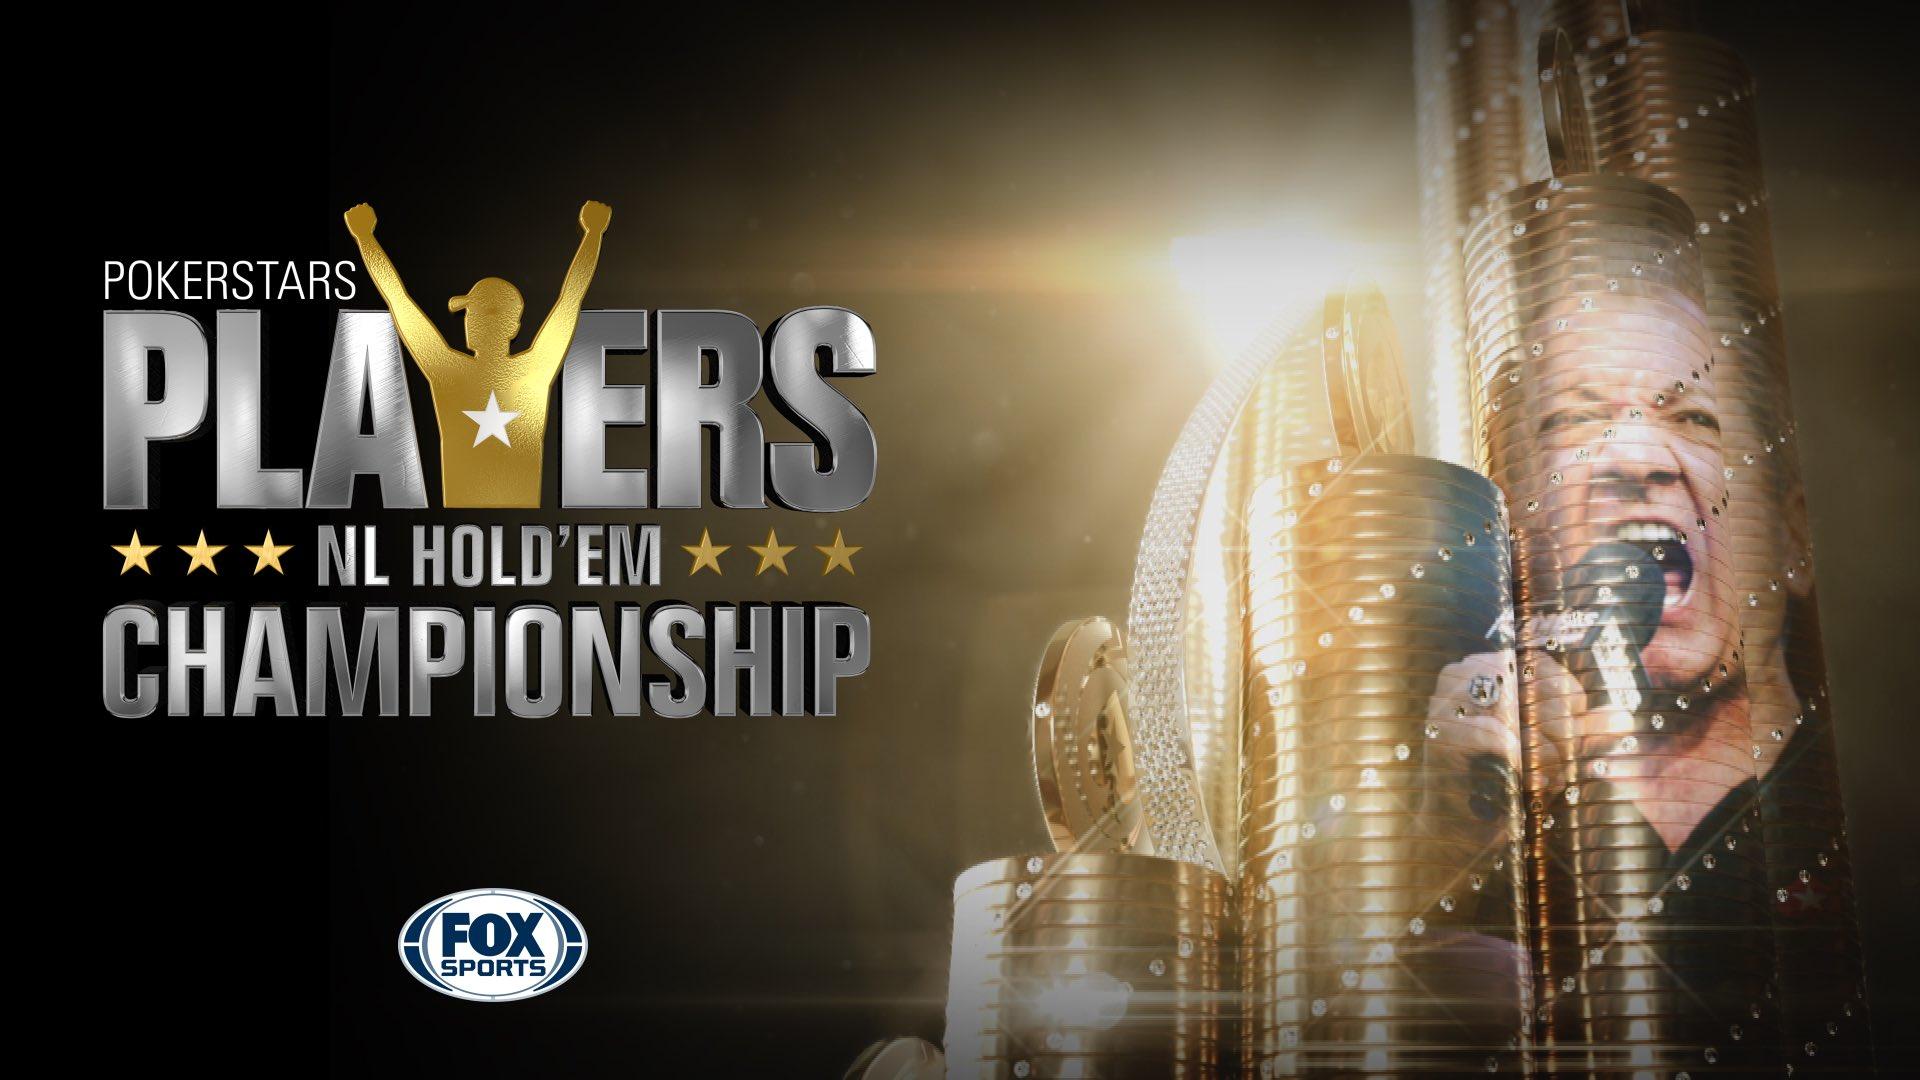 PokerStars Returns to US TV with Nine-Episode PSPC Coverage